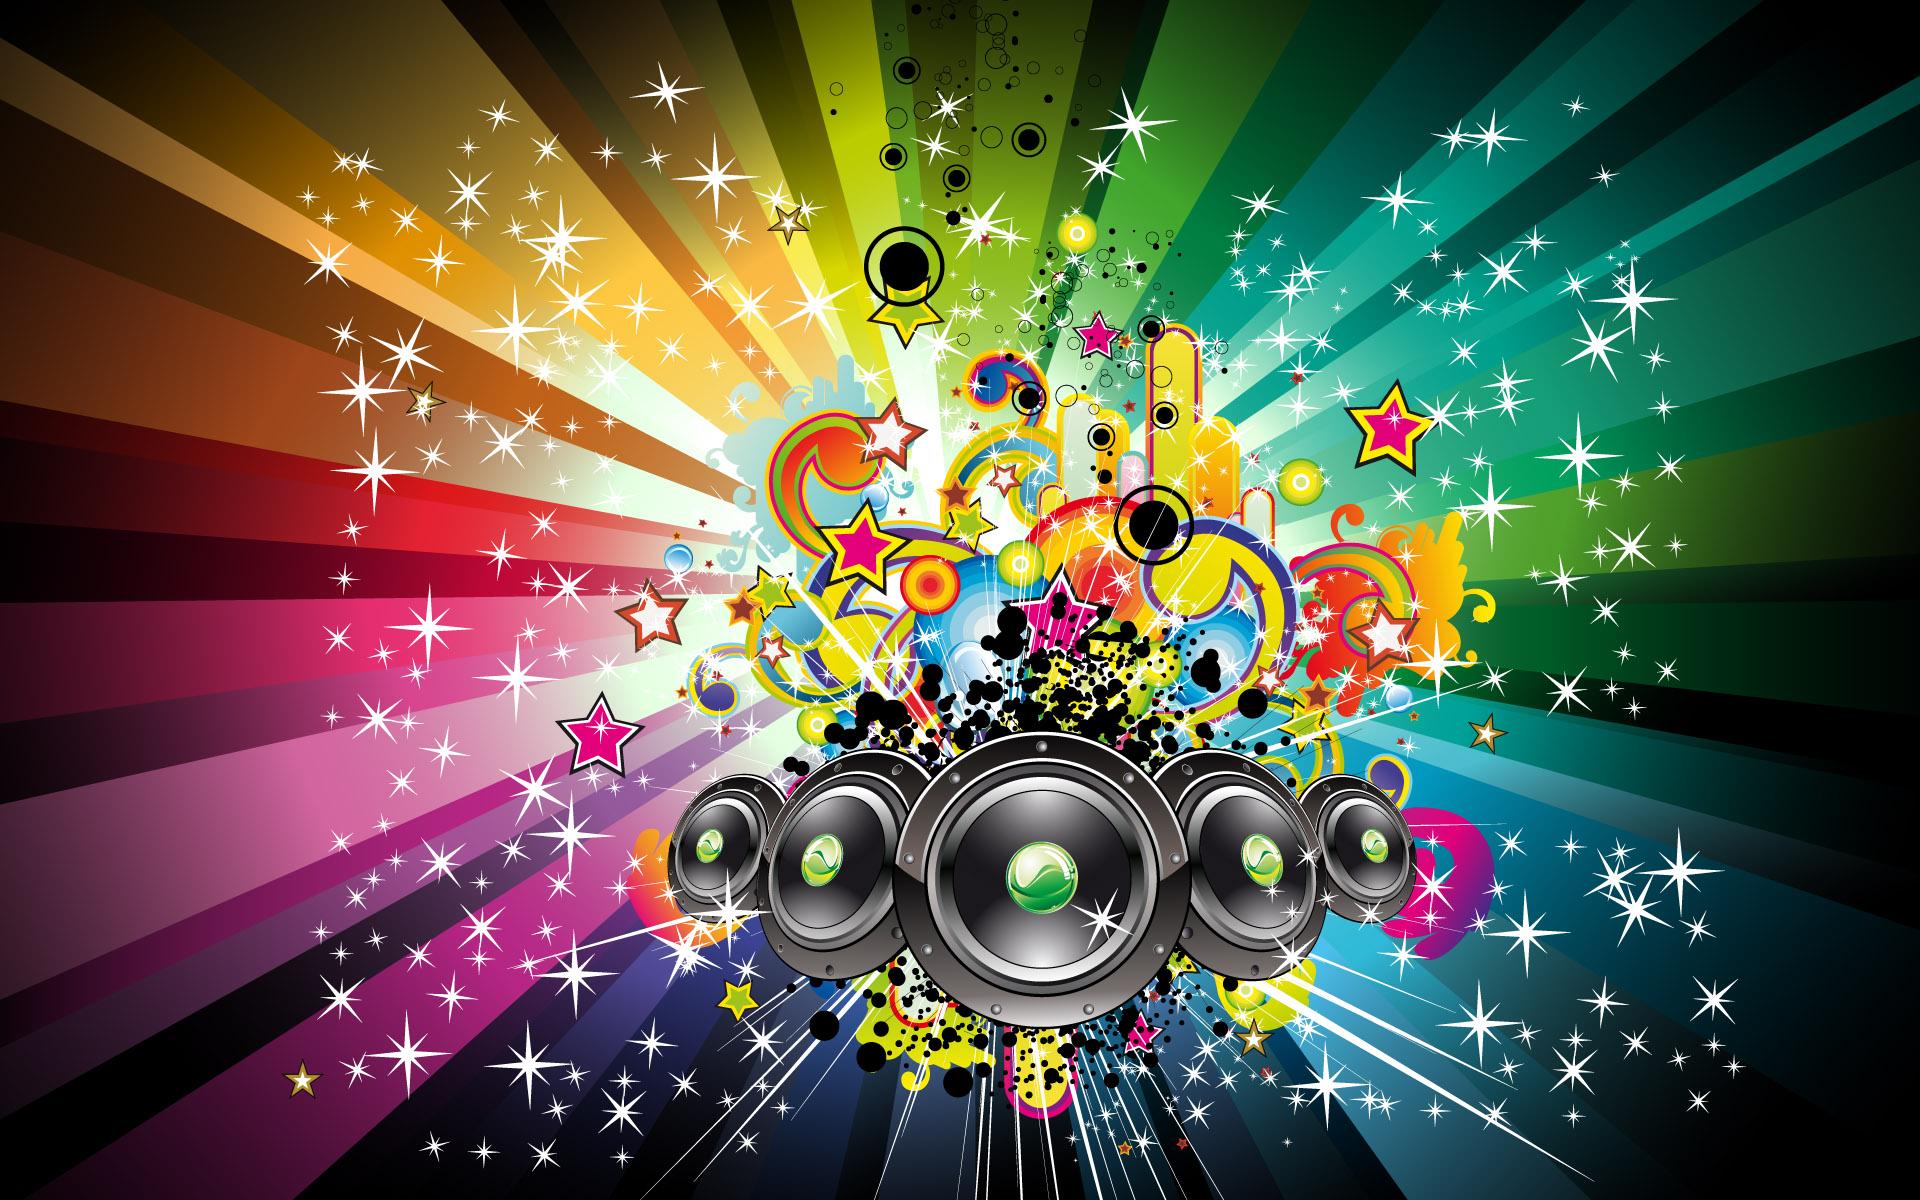 Rock Music Star 1920x1200 5968 HD Wallpaper Res 1920x1200 1920x1200